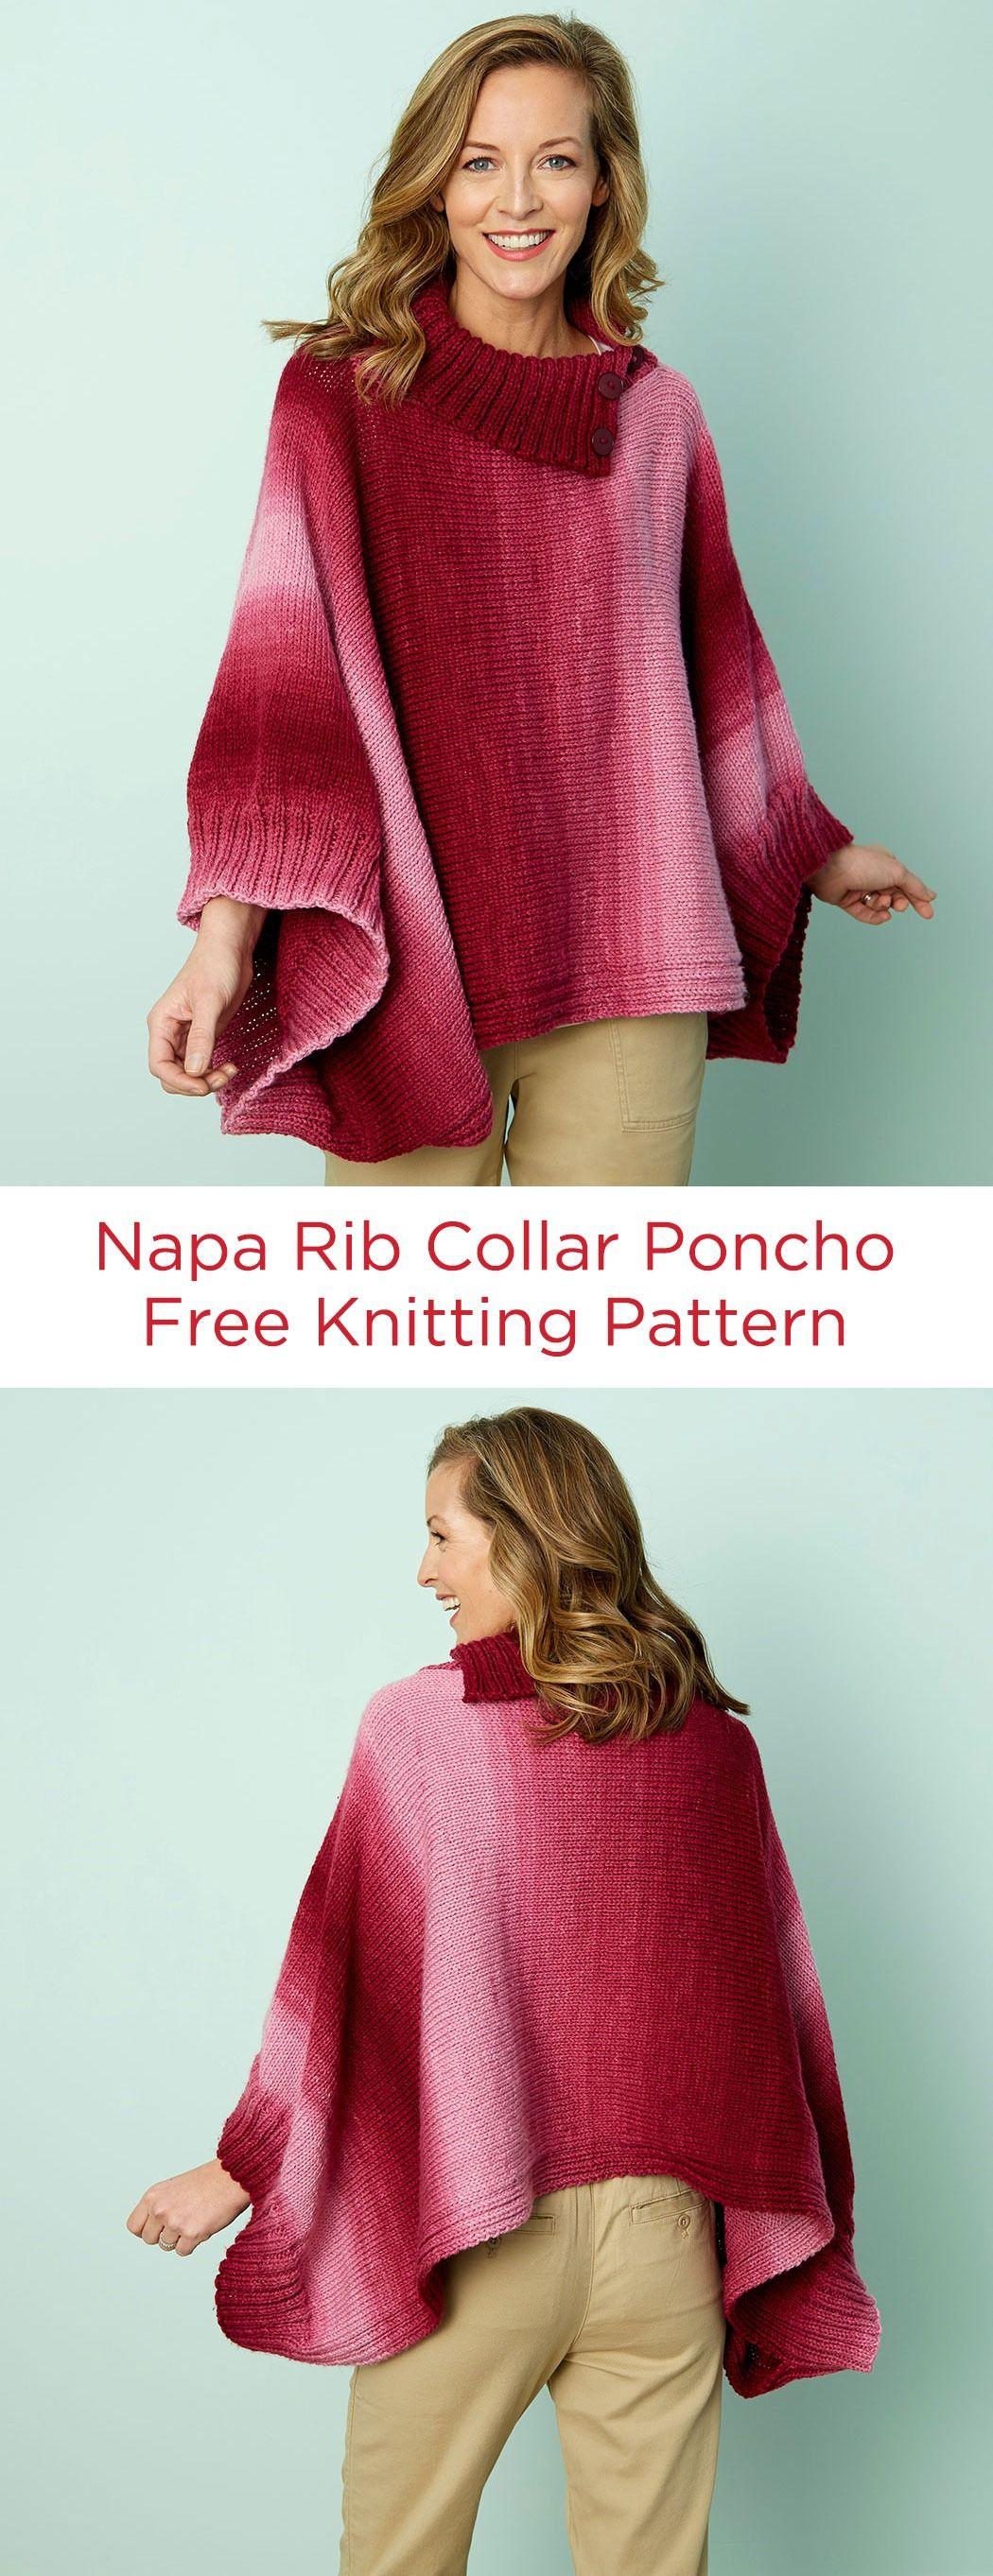 Napa Rib Collar Poncho Free Knitting Pattern in Red Heart Super ...